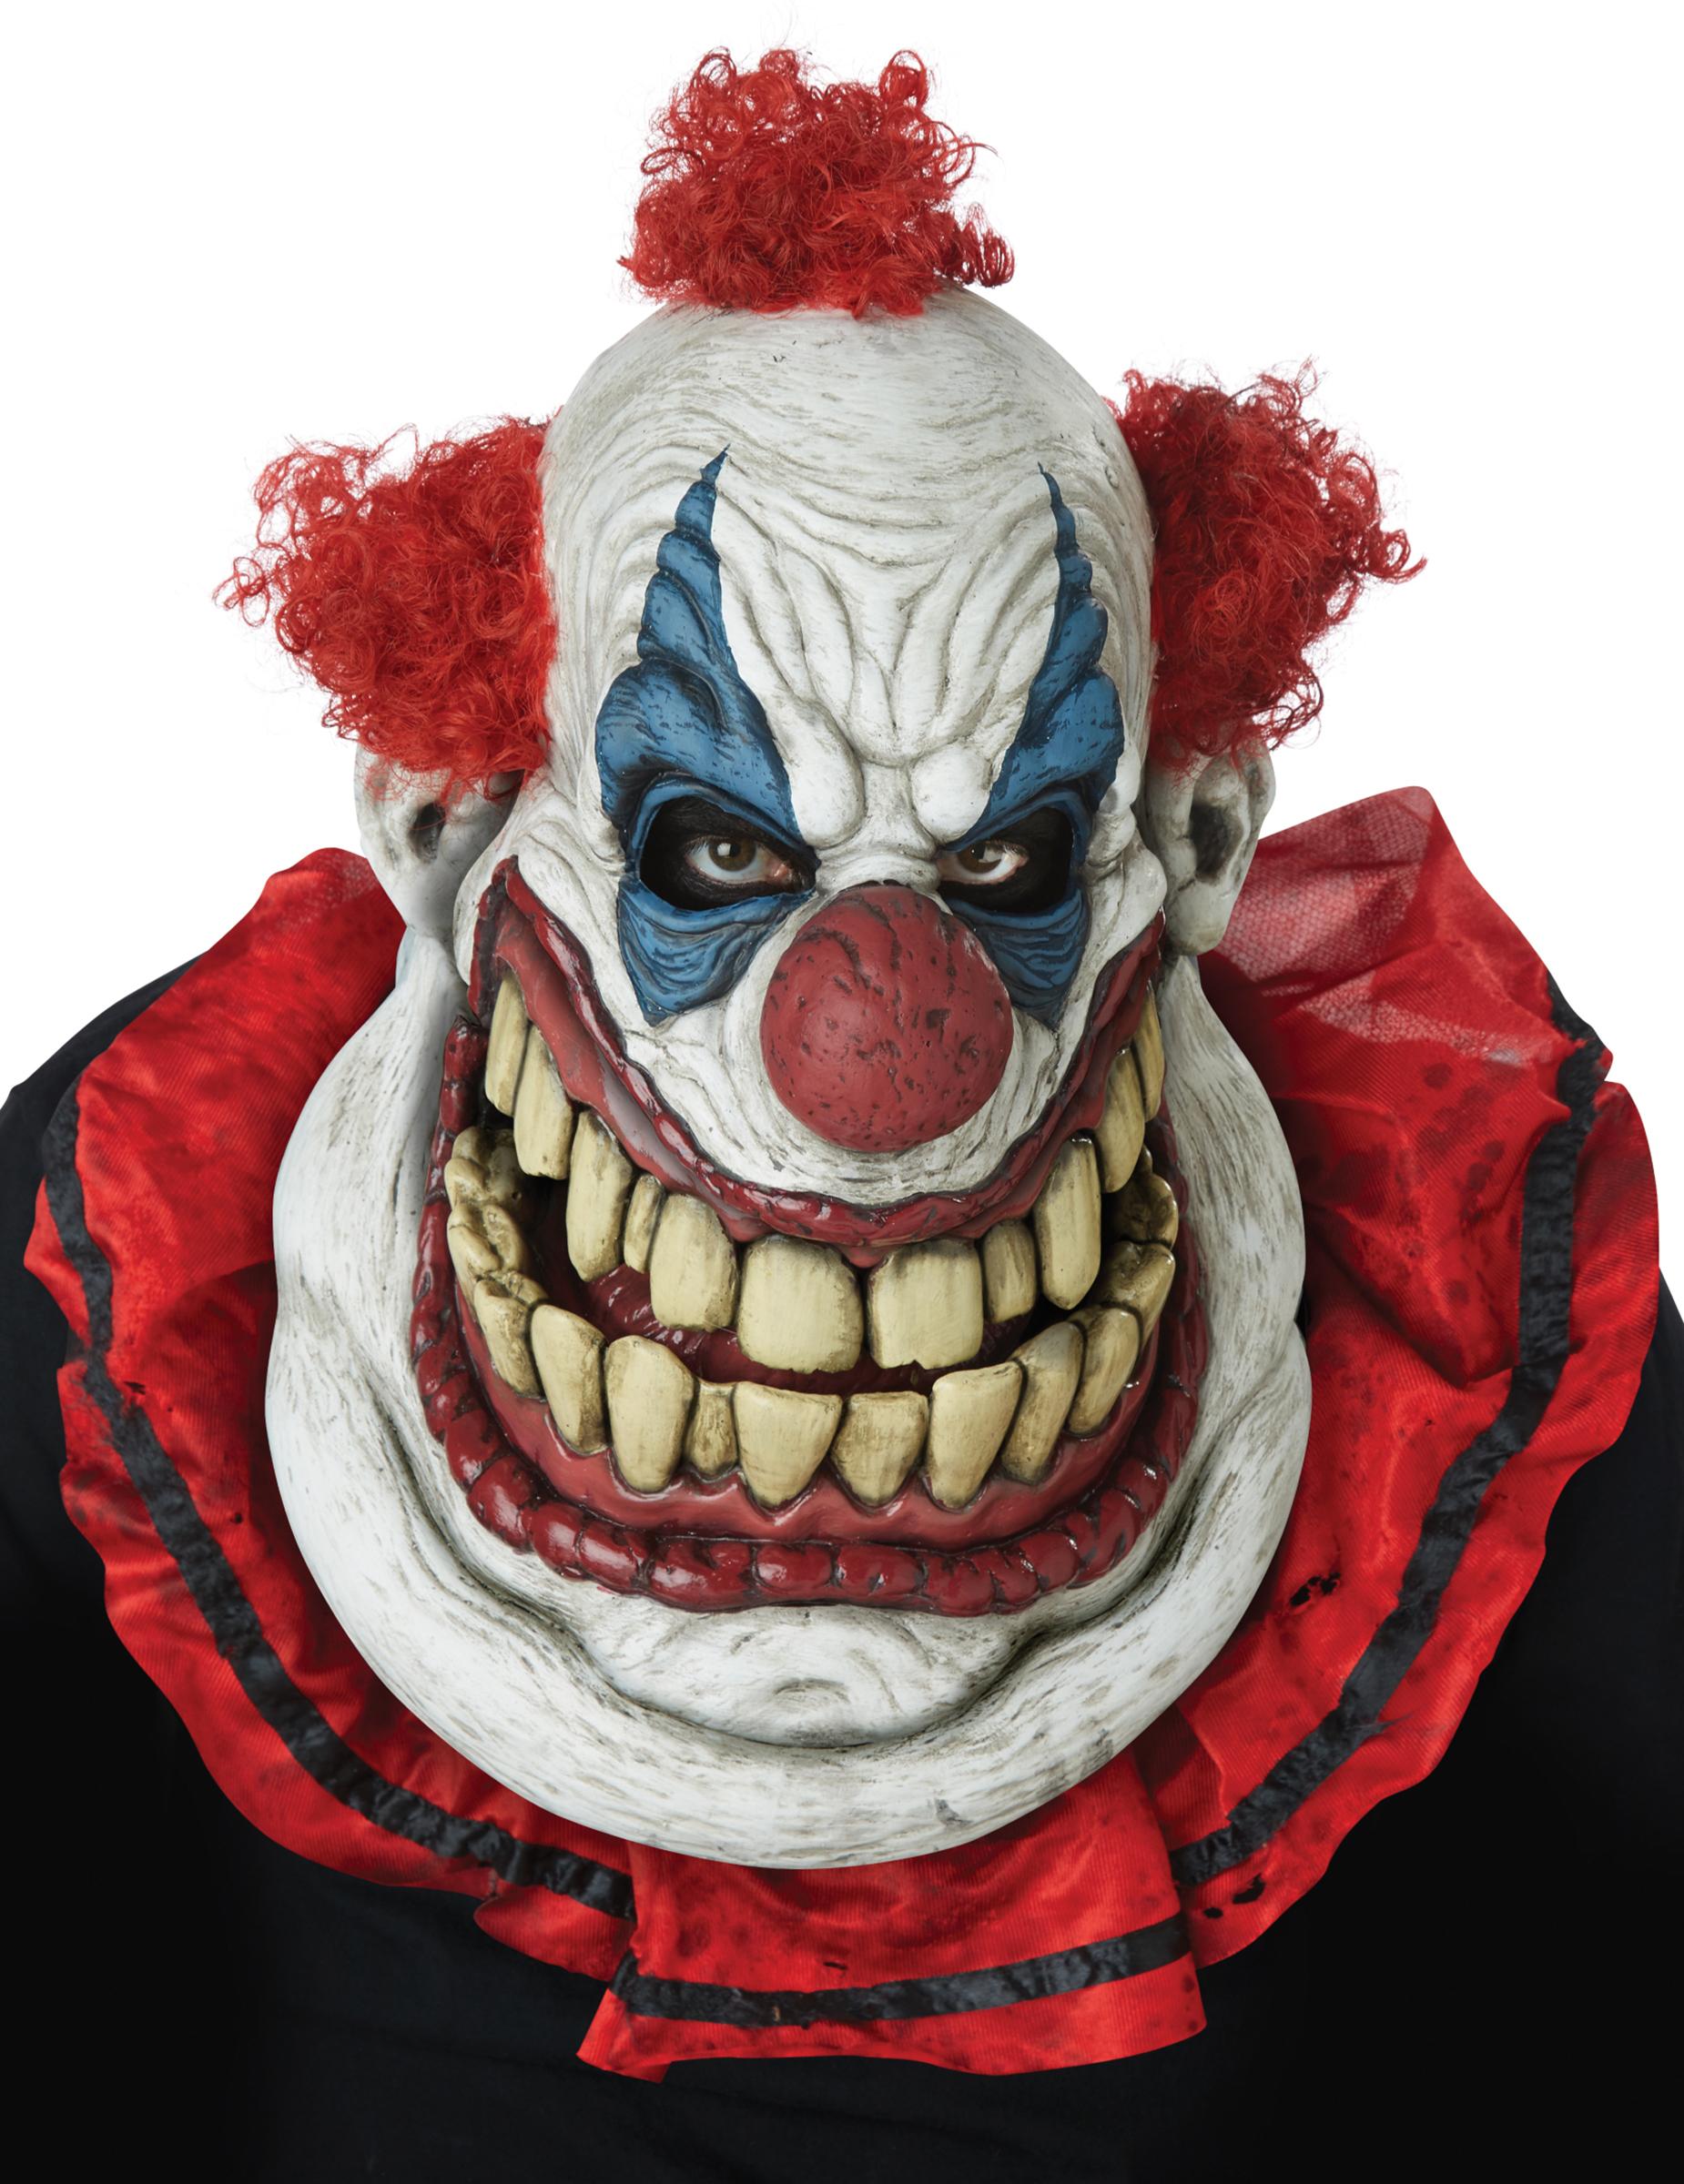 riesige-horrorclown-maske-fur-erwachsene-halloween.jpg